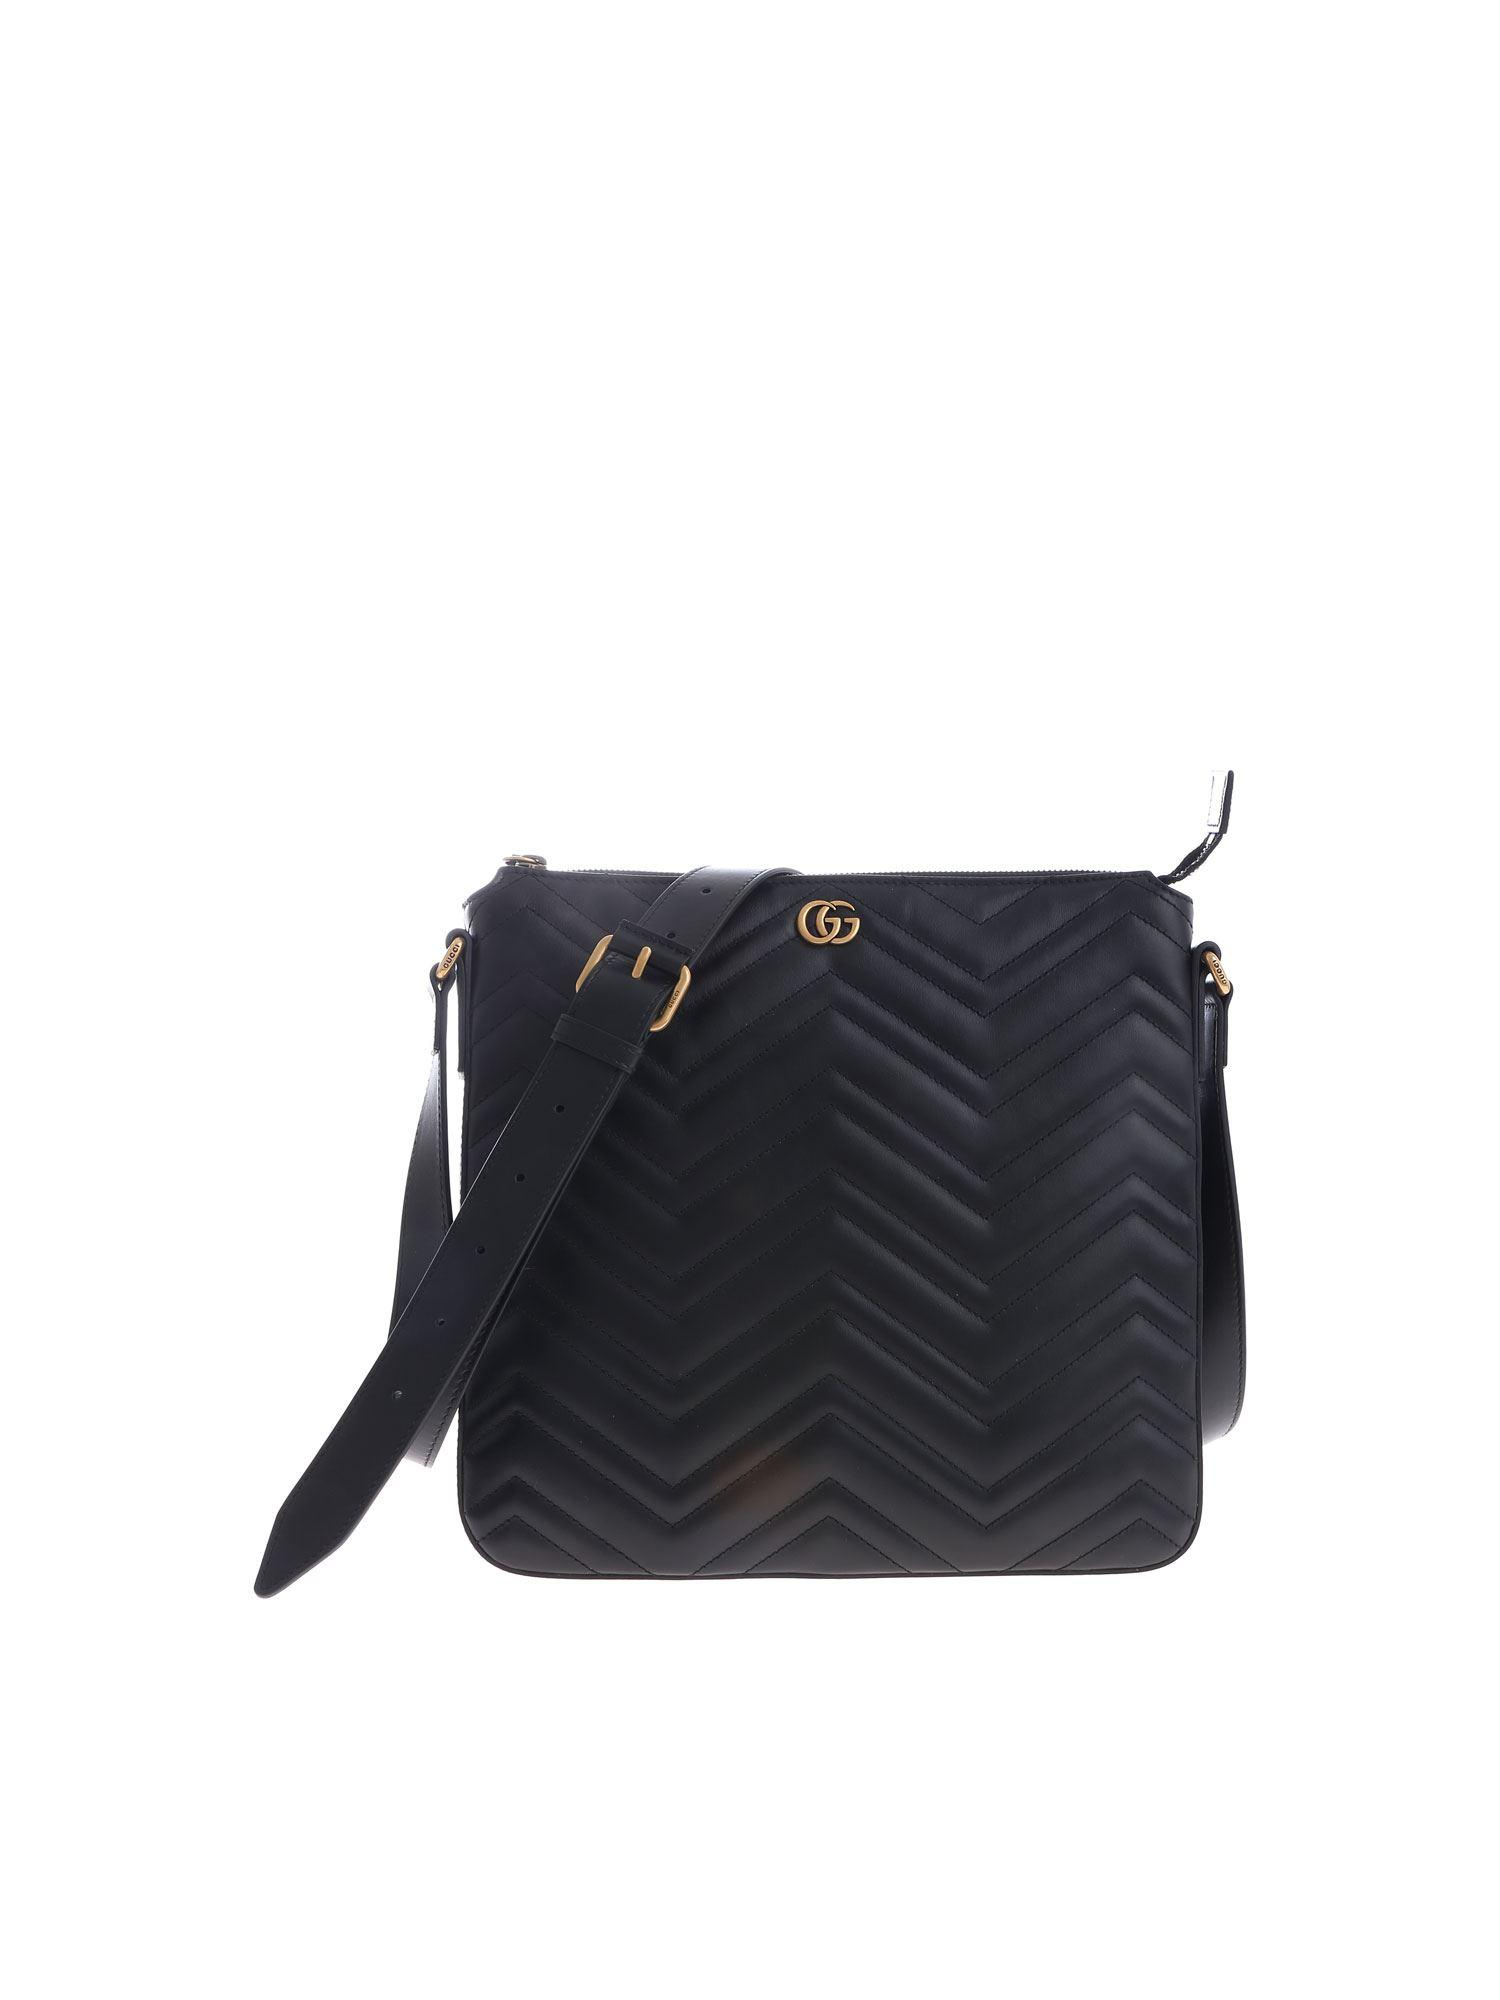 9380c6e7cca Lyst - Gucci Messenger Marmont Crossbody Bag in Blue for Men